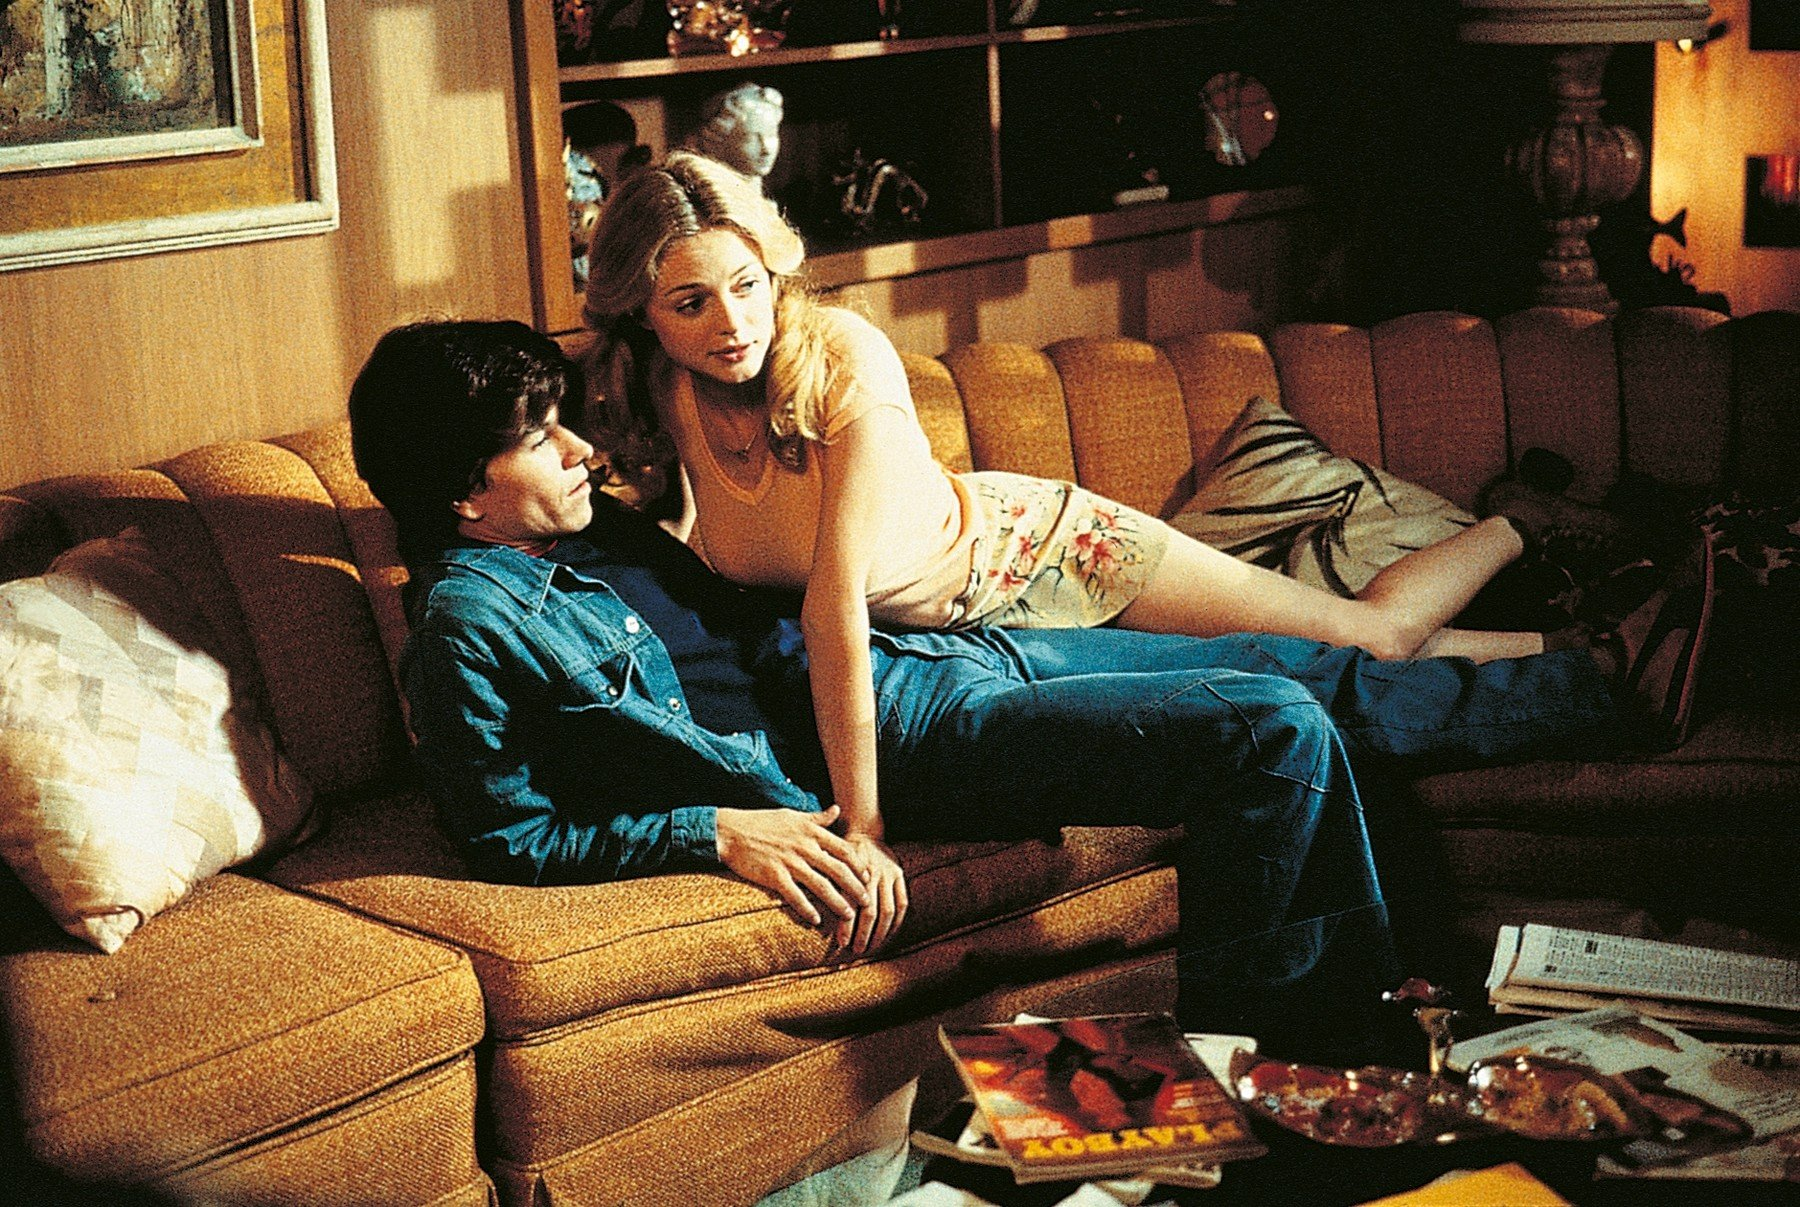 Boogie Nights (1997)  Mark Wahlberg, Heather Graham *Filmstill - Editorial Use Only*, Image: 278949445, License: Rights-managed, Restrictions: *Filmstill - Editorial Use Only*, Model Release: no, Credit line: Profimedia, Film Stills